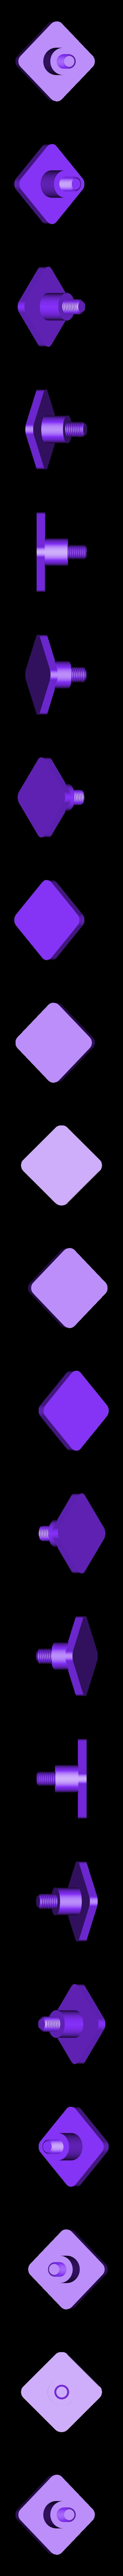 portomine_poignee_losange01.STL Download free STL file Portomine lozenge hook • 3D print template, Tibe-Design